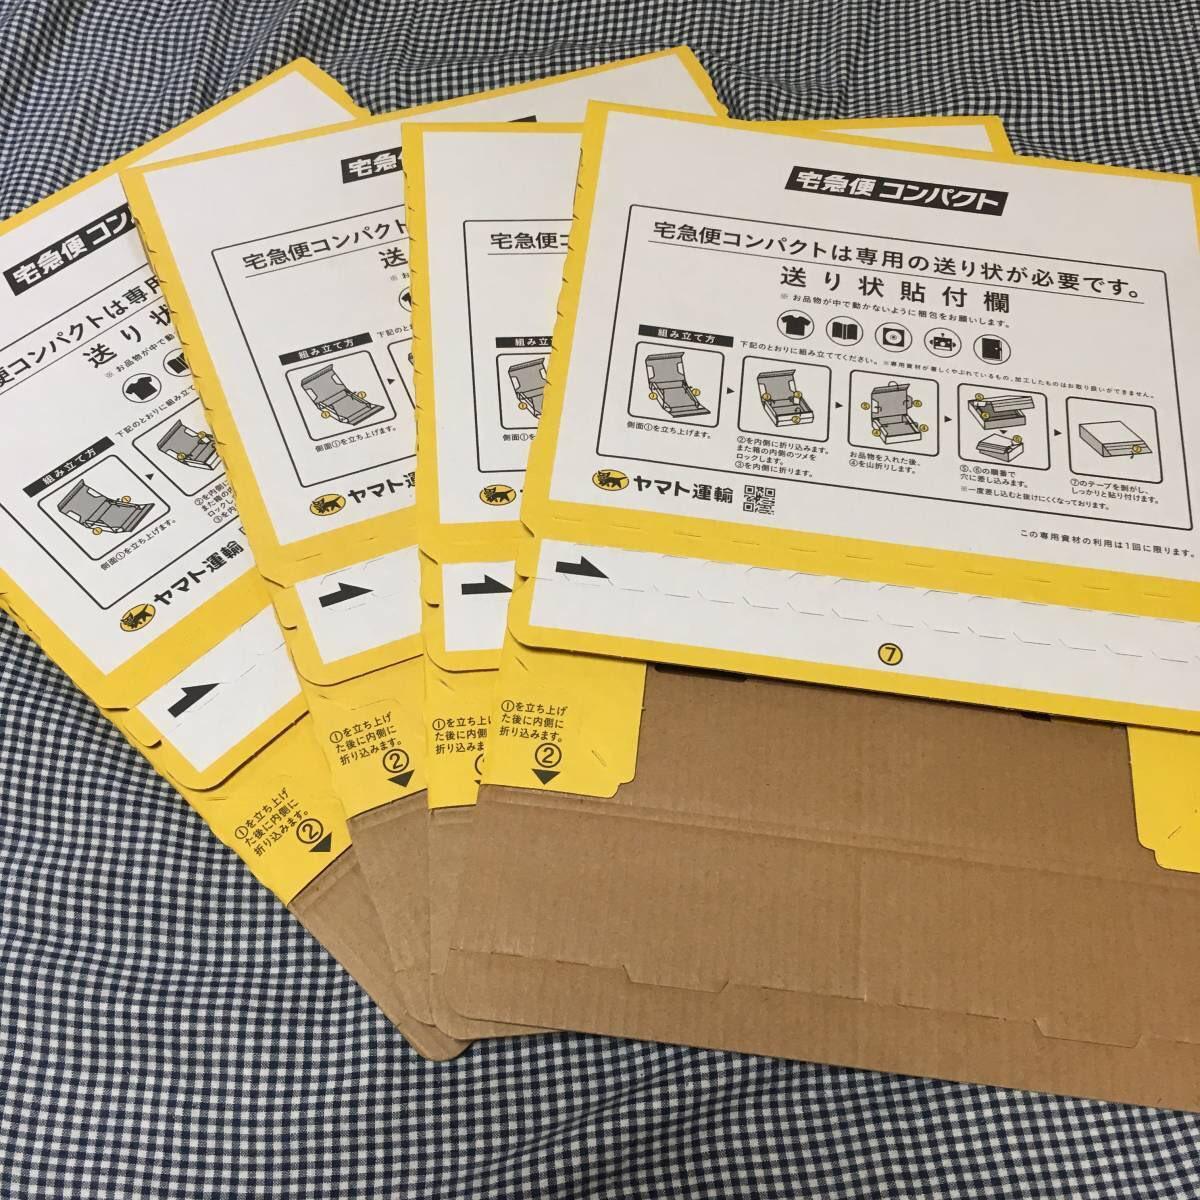 test ツイッターメディア - 【送料無料】クロネコヤマト 宅急便コンパクト専用BOX ボックス 新品未使用品 6枚 https://t.co/Bz3tNmEUoV https://t.co/PY0nNbO3TM